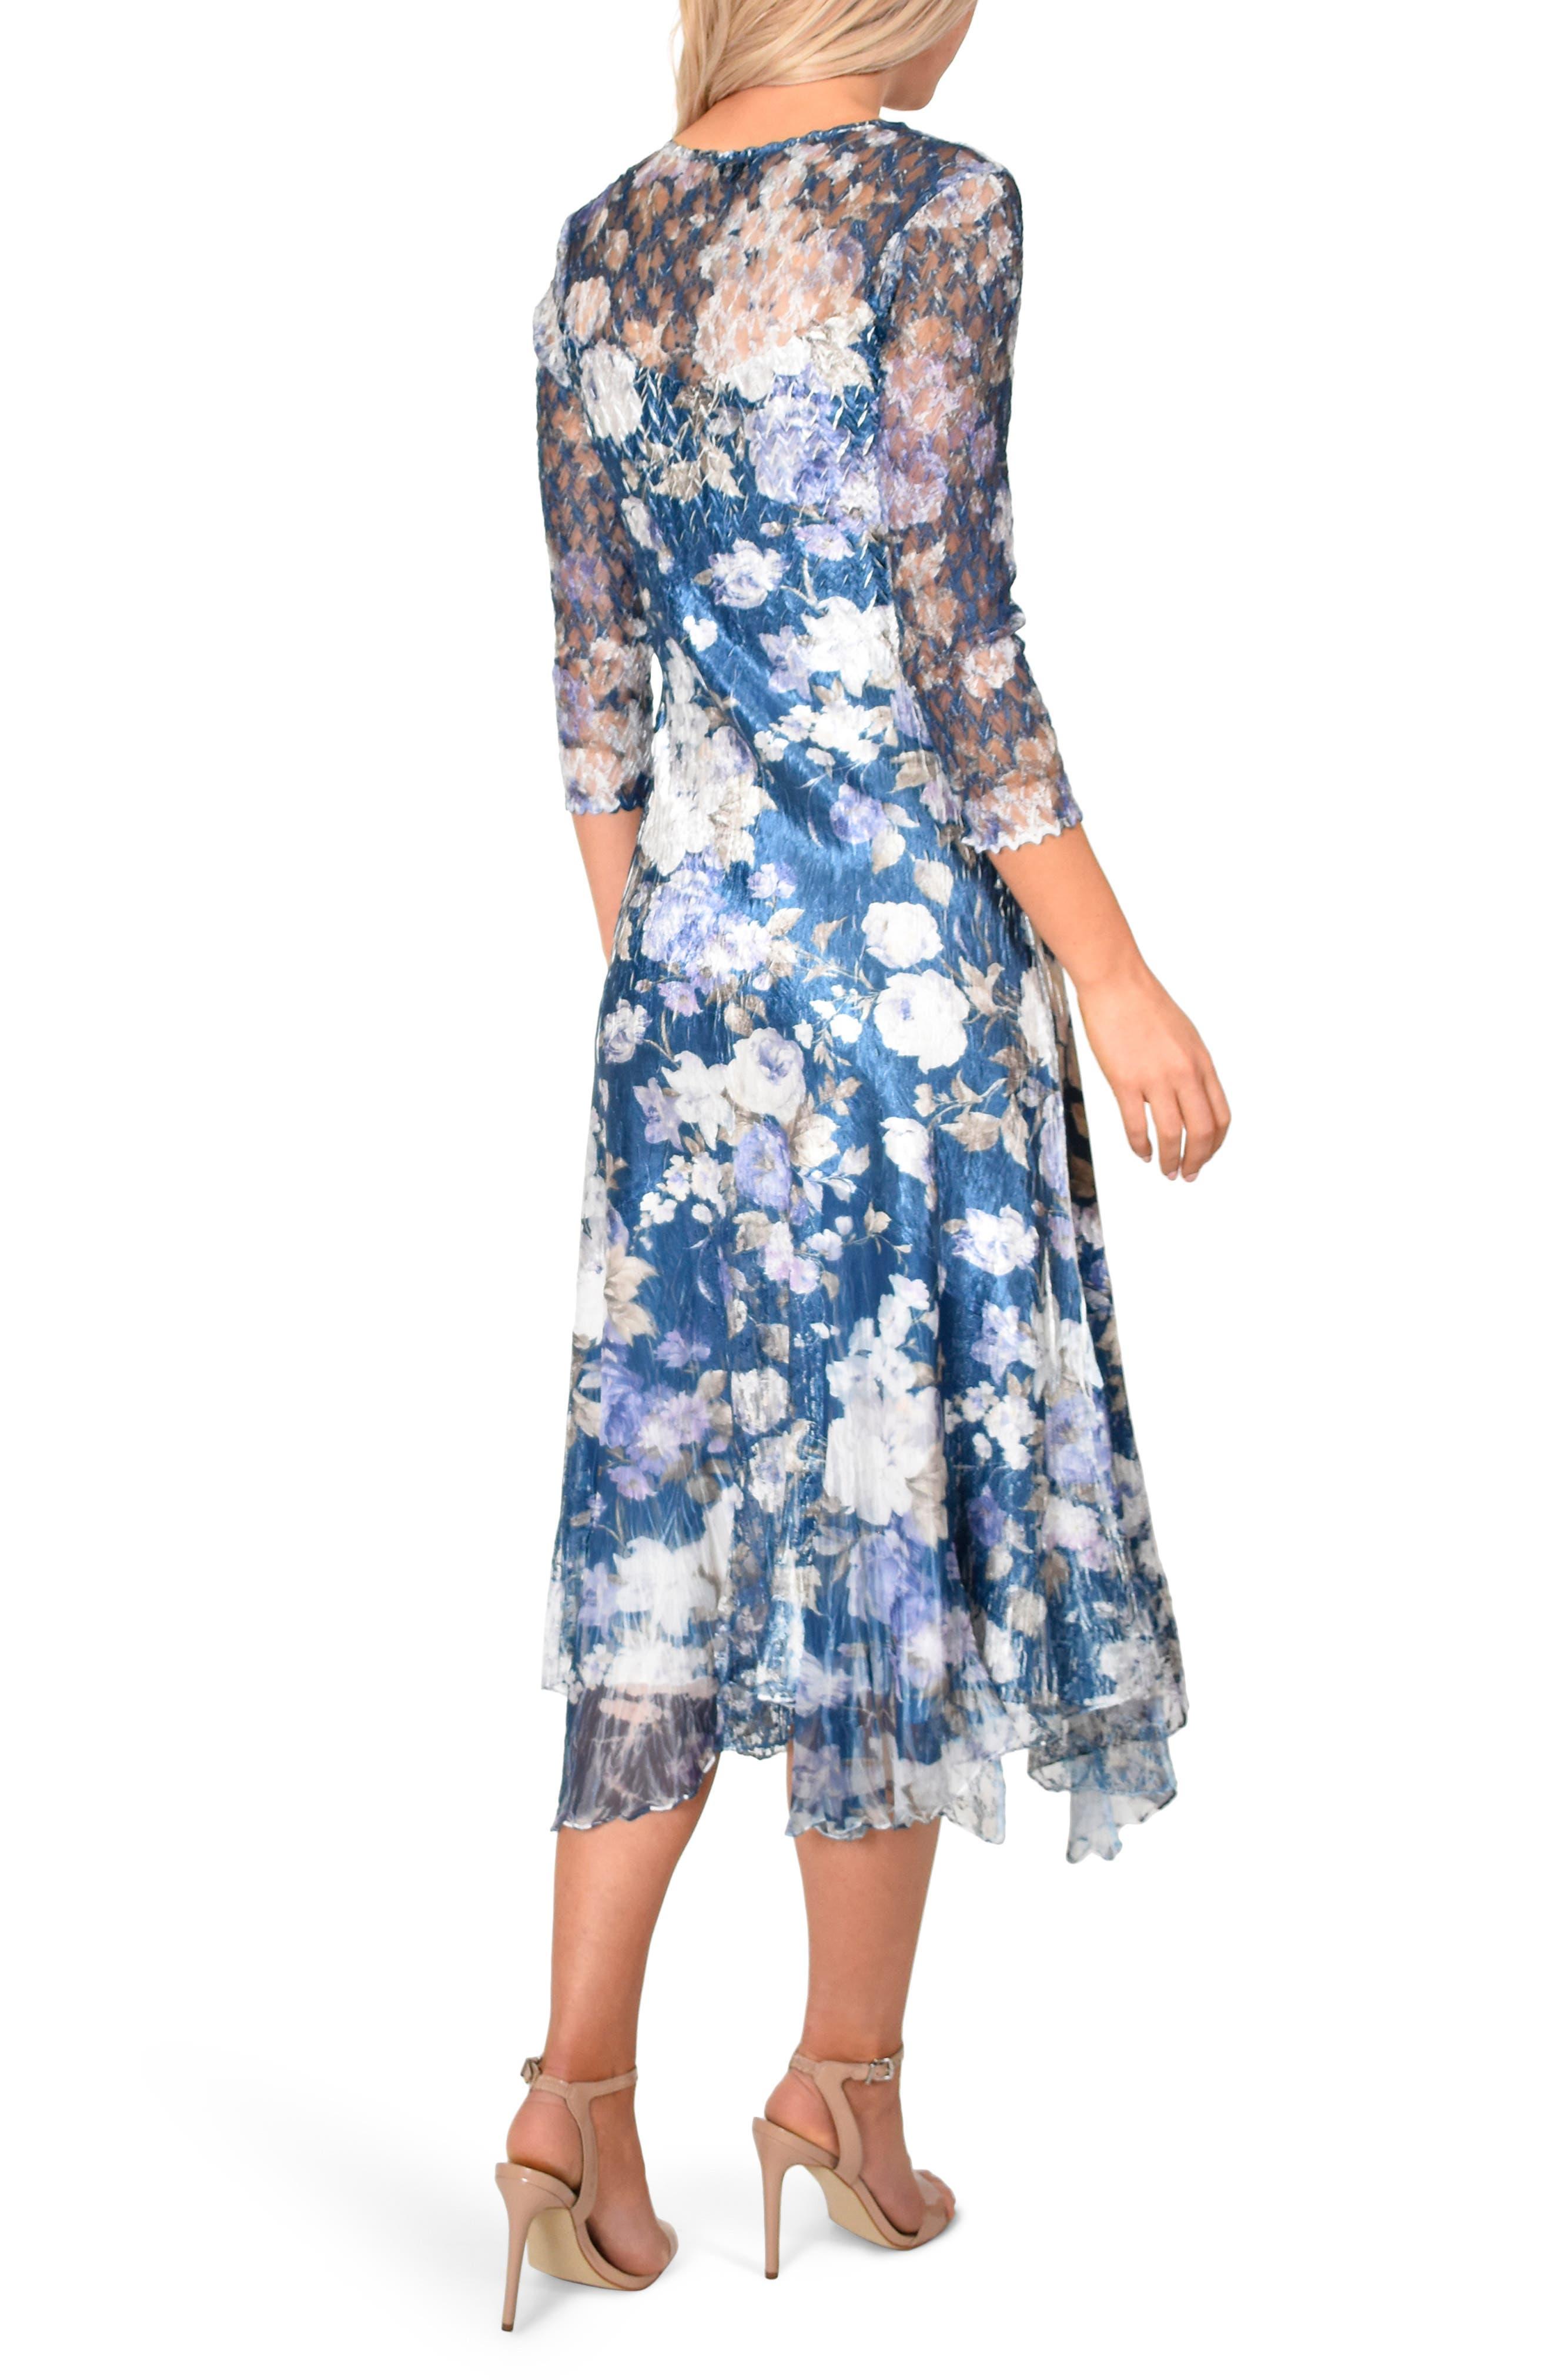 KOMAROV, Floral Charmeuse & Chiffon Dress, Alternate thumbnail 2, color, OLENADER NIGHT